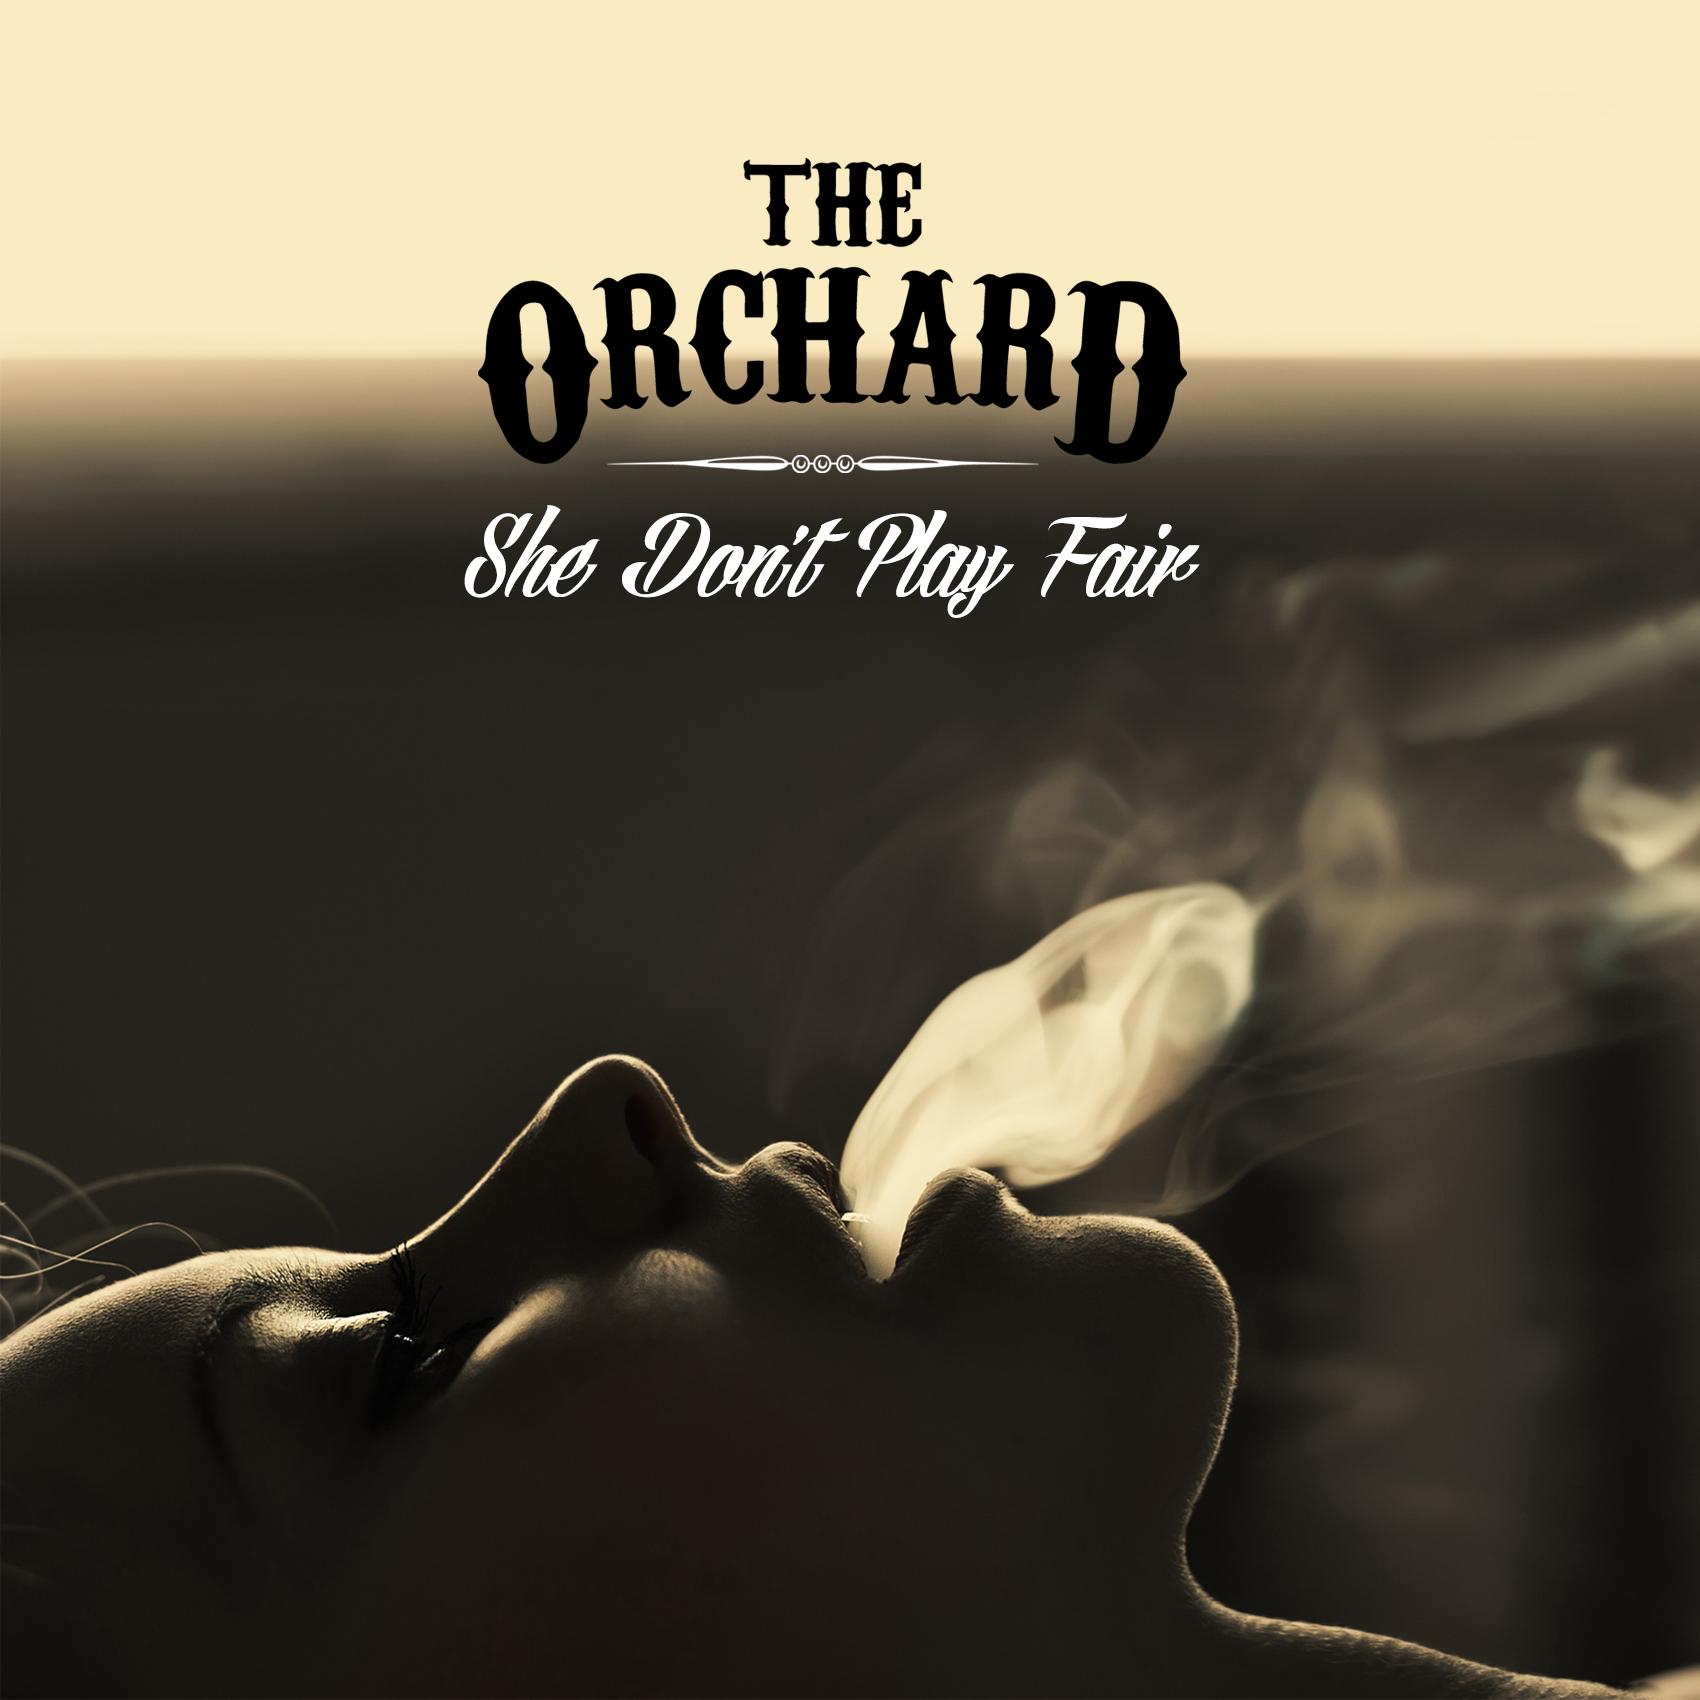 TheOrchard-SDPF